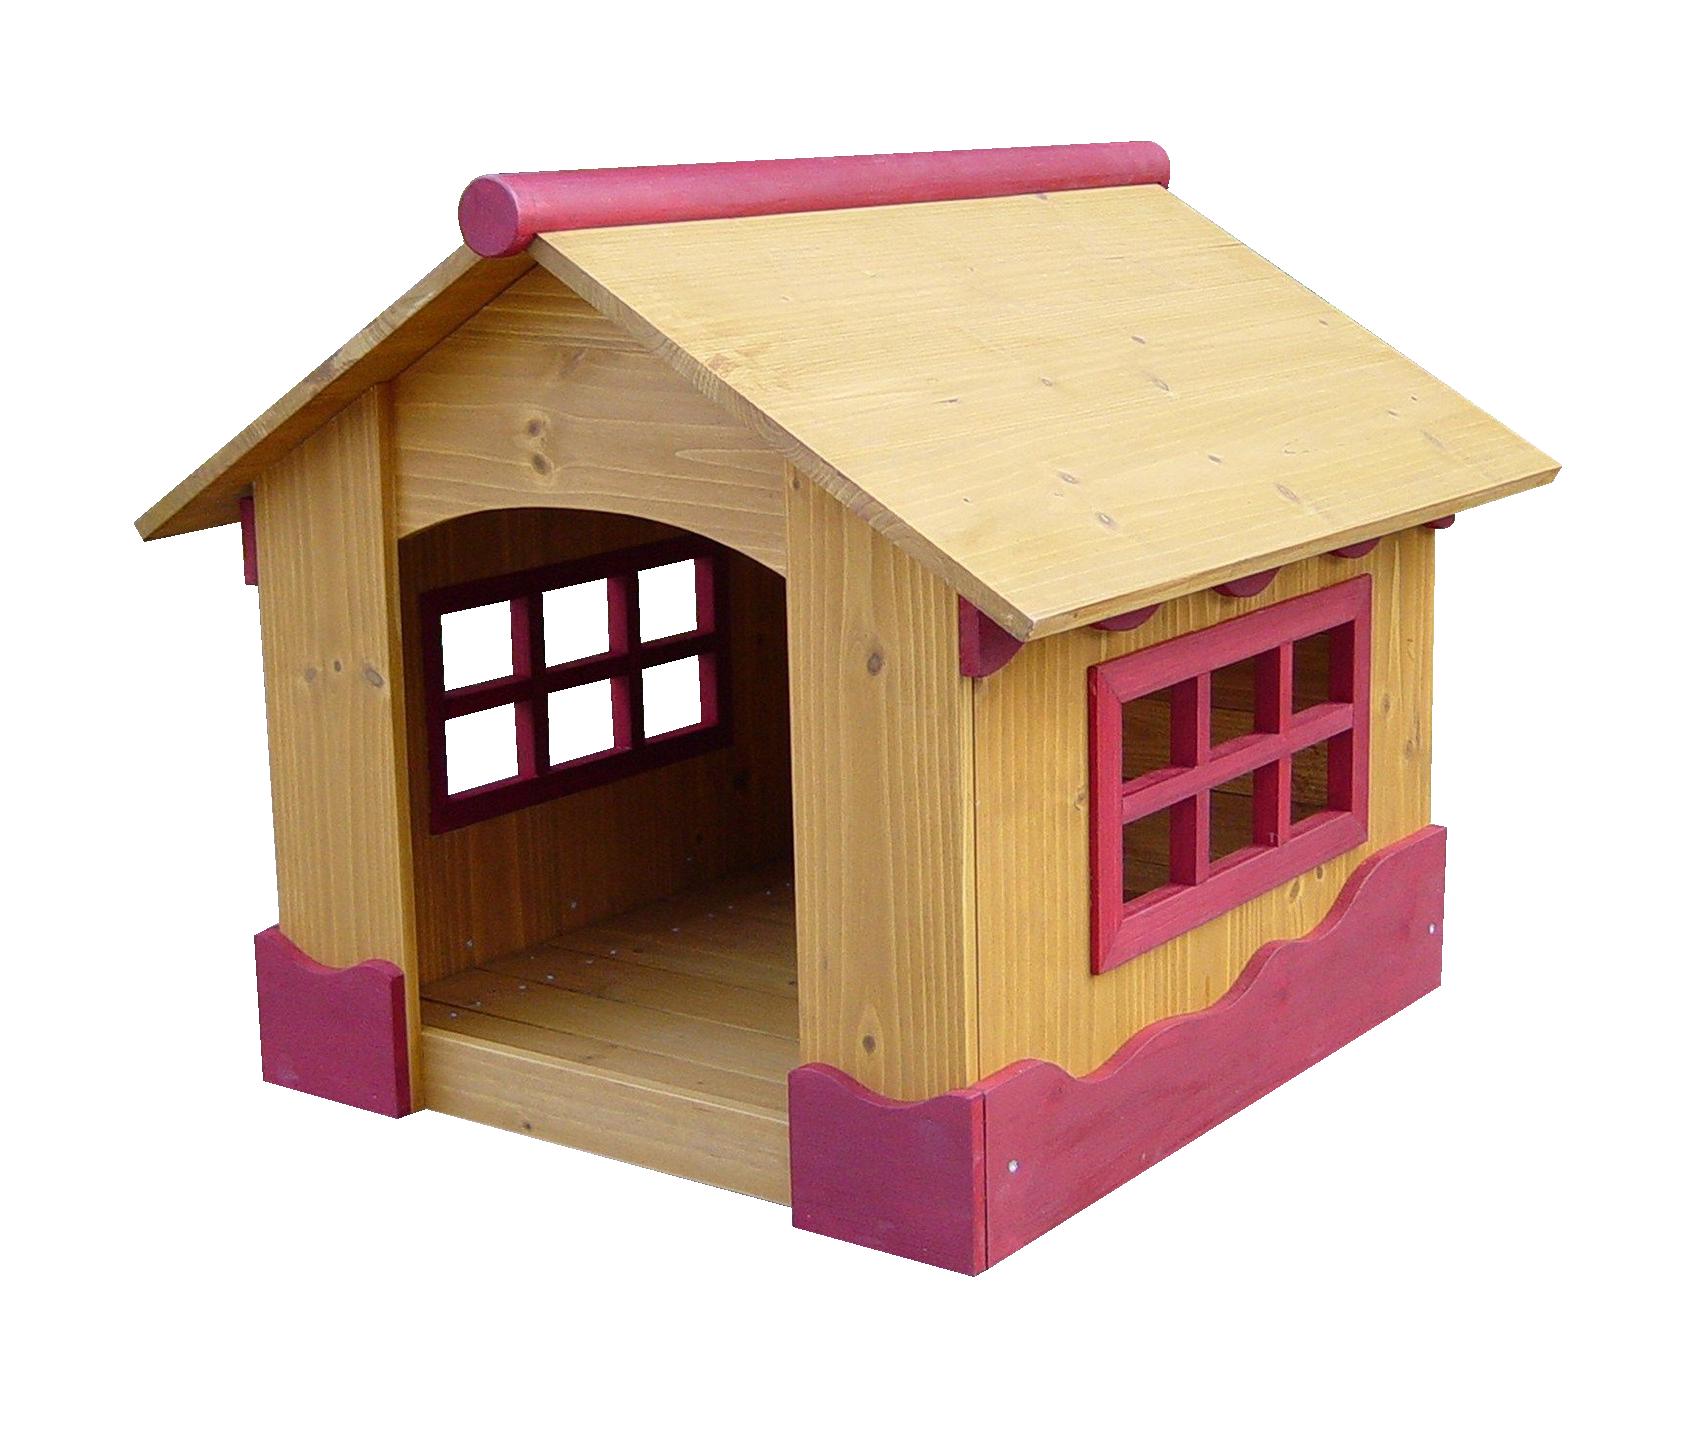 Image purepng free transparent. Dog house png